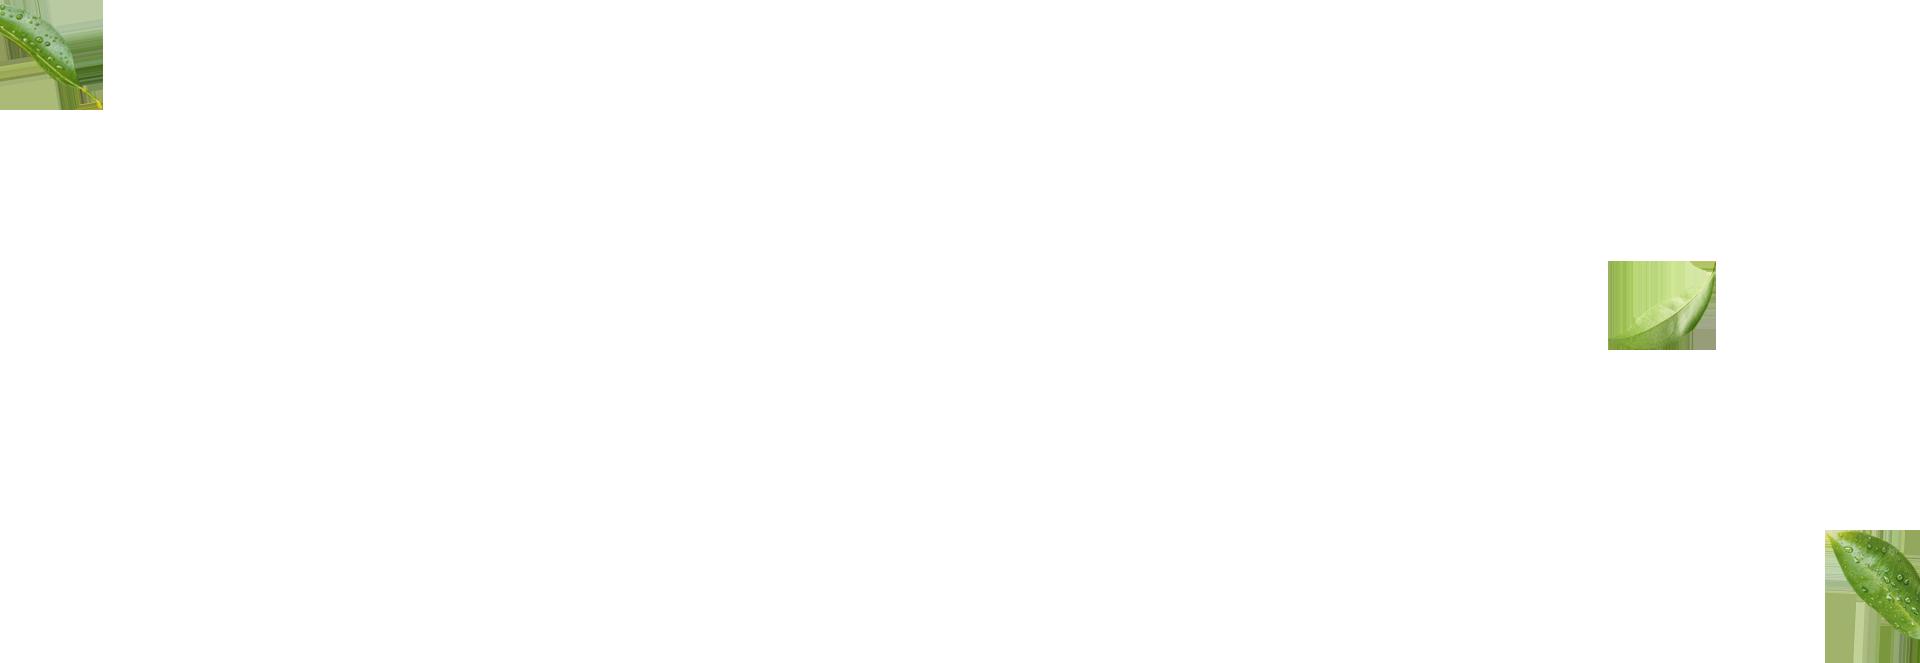 ltx-parallax-layer